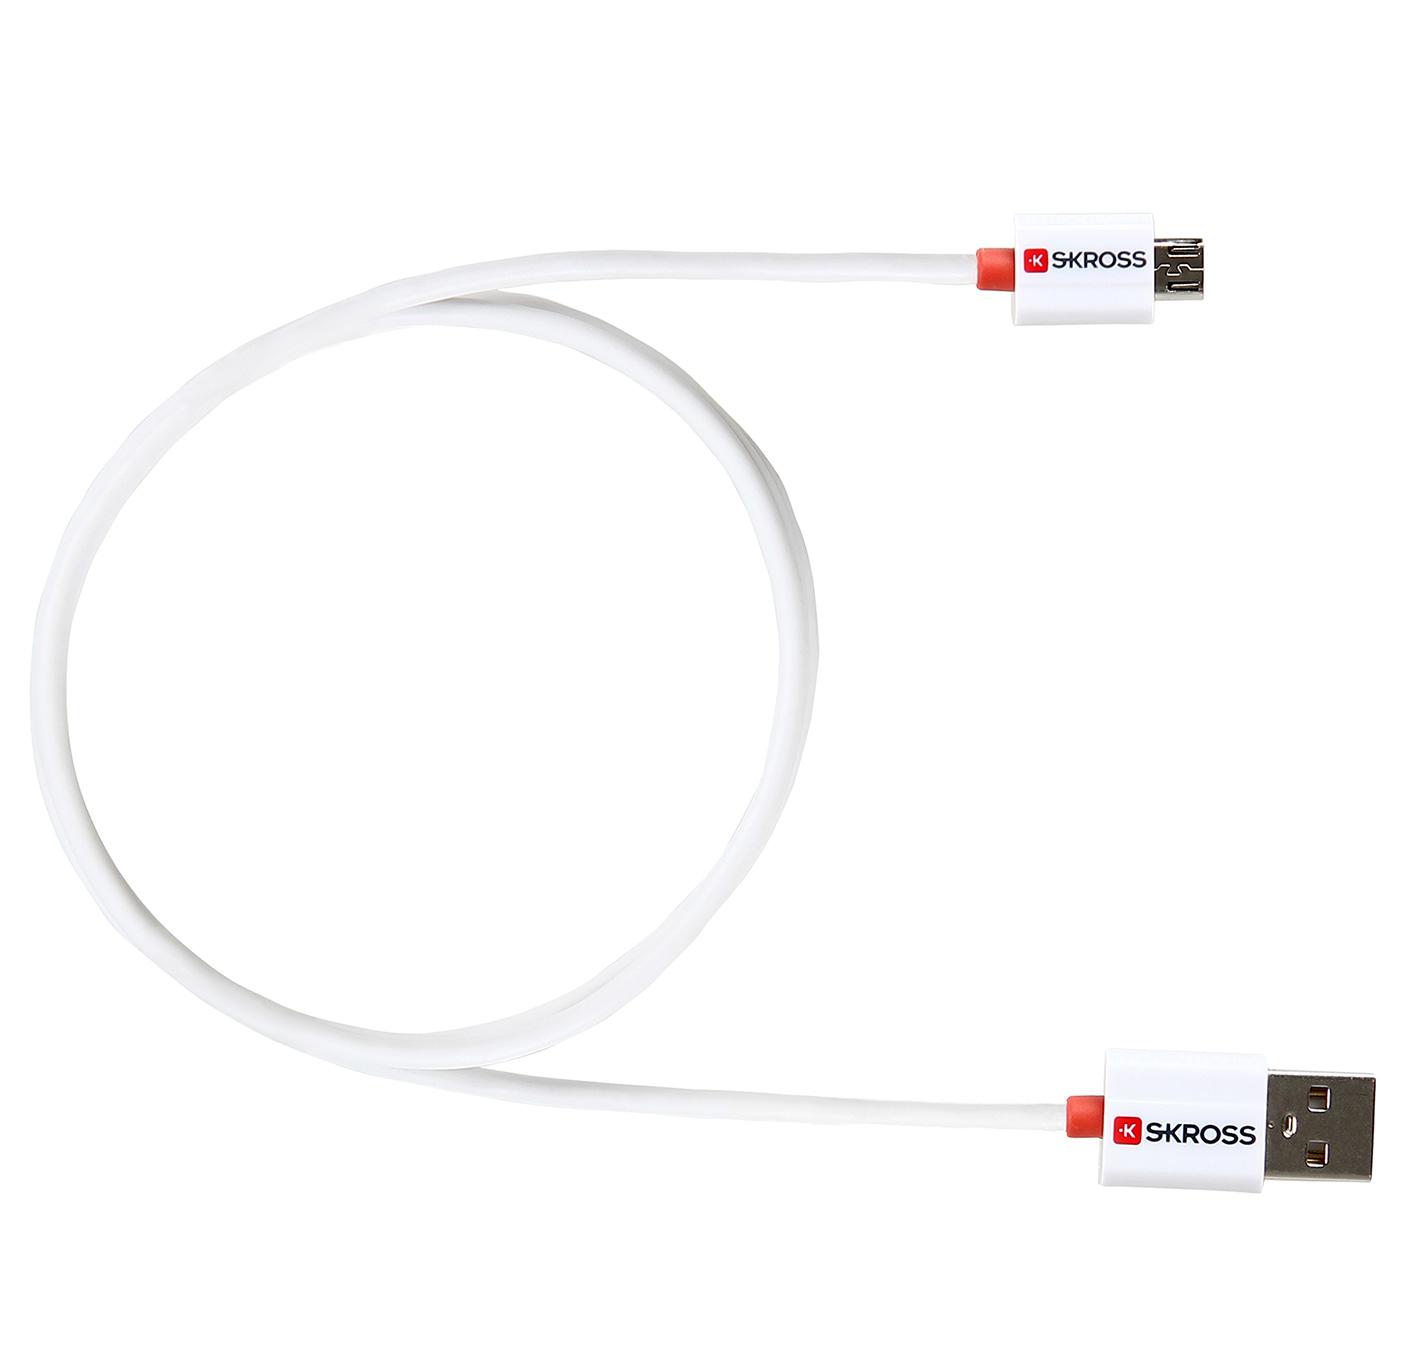 SWA1400102-Micro-USB-Cable.jpg